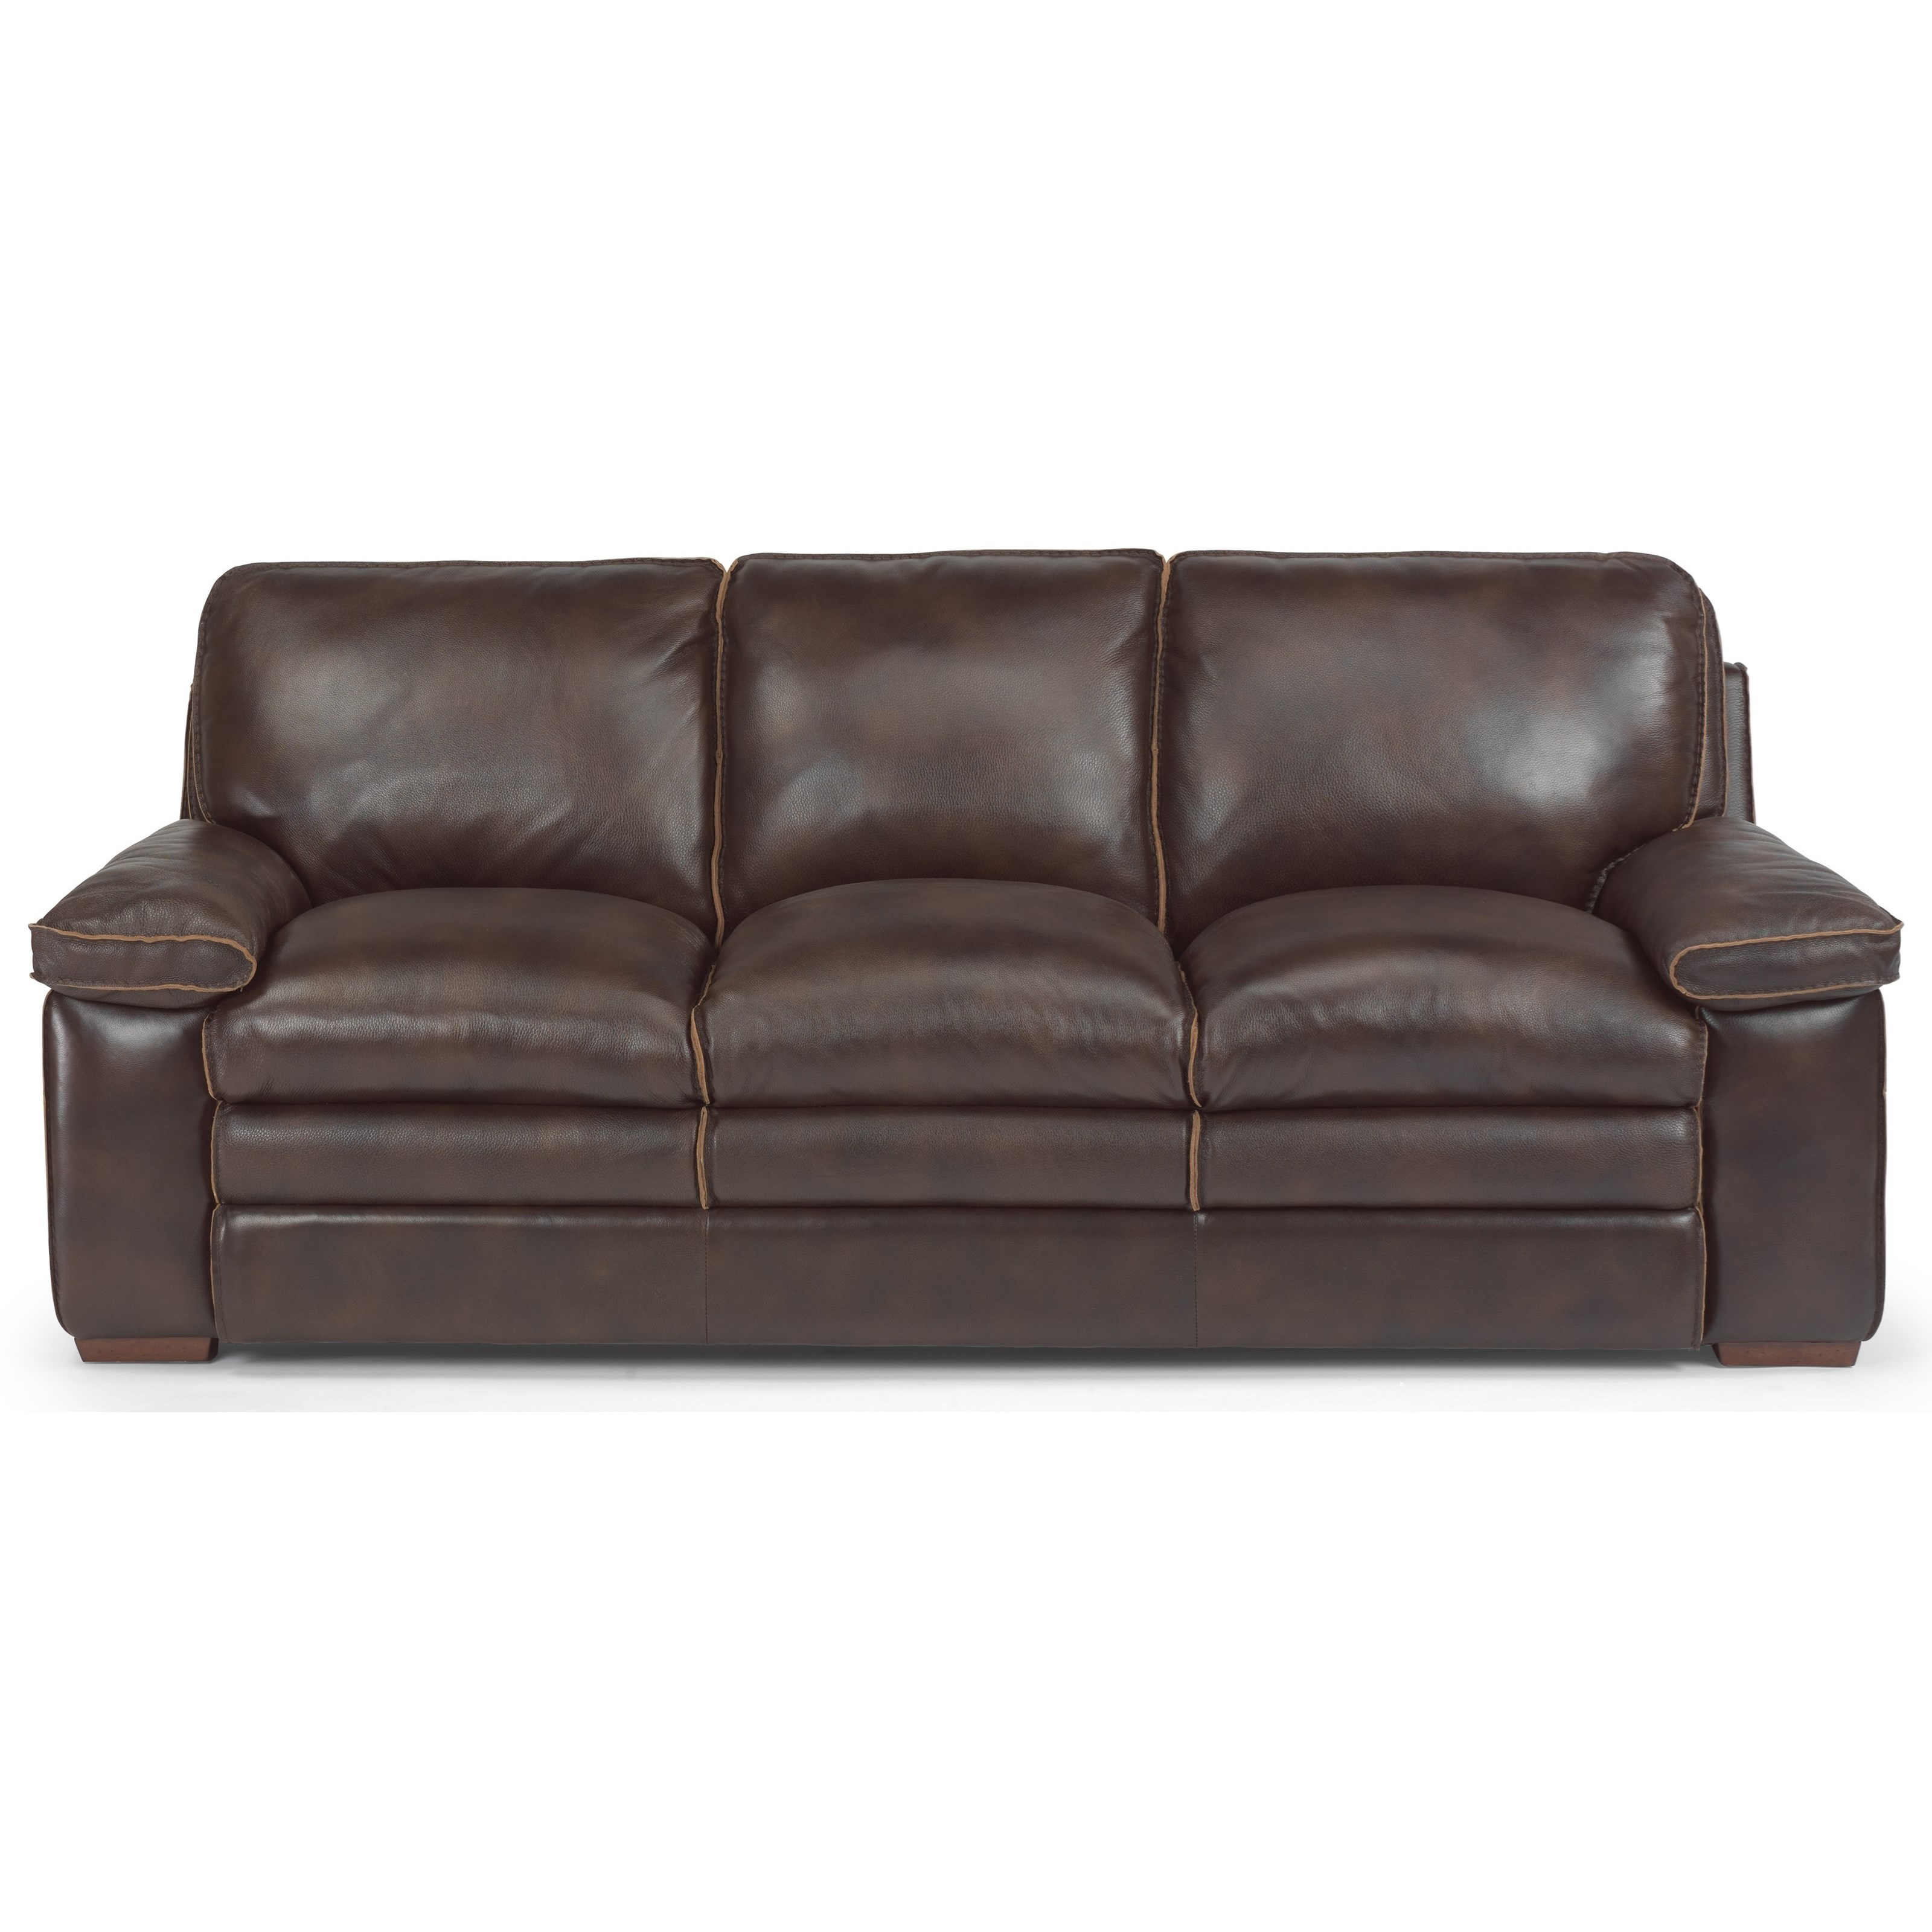 flexsteel latitudes penthouse casual sofa with pillow top seating rh furnituremartco com sofa mart colorado springs co